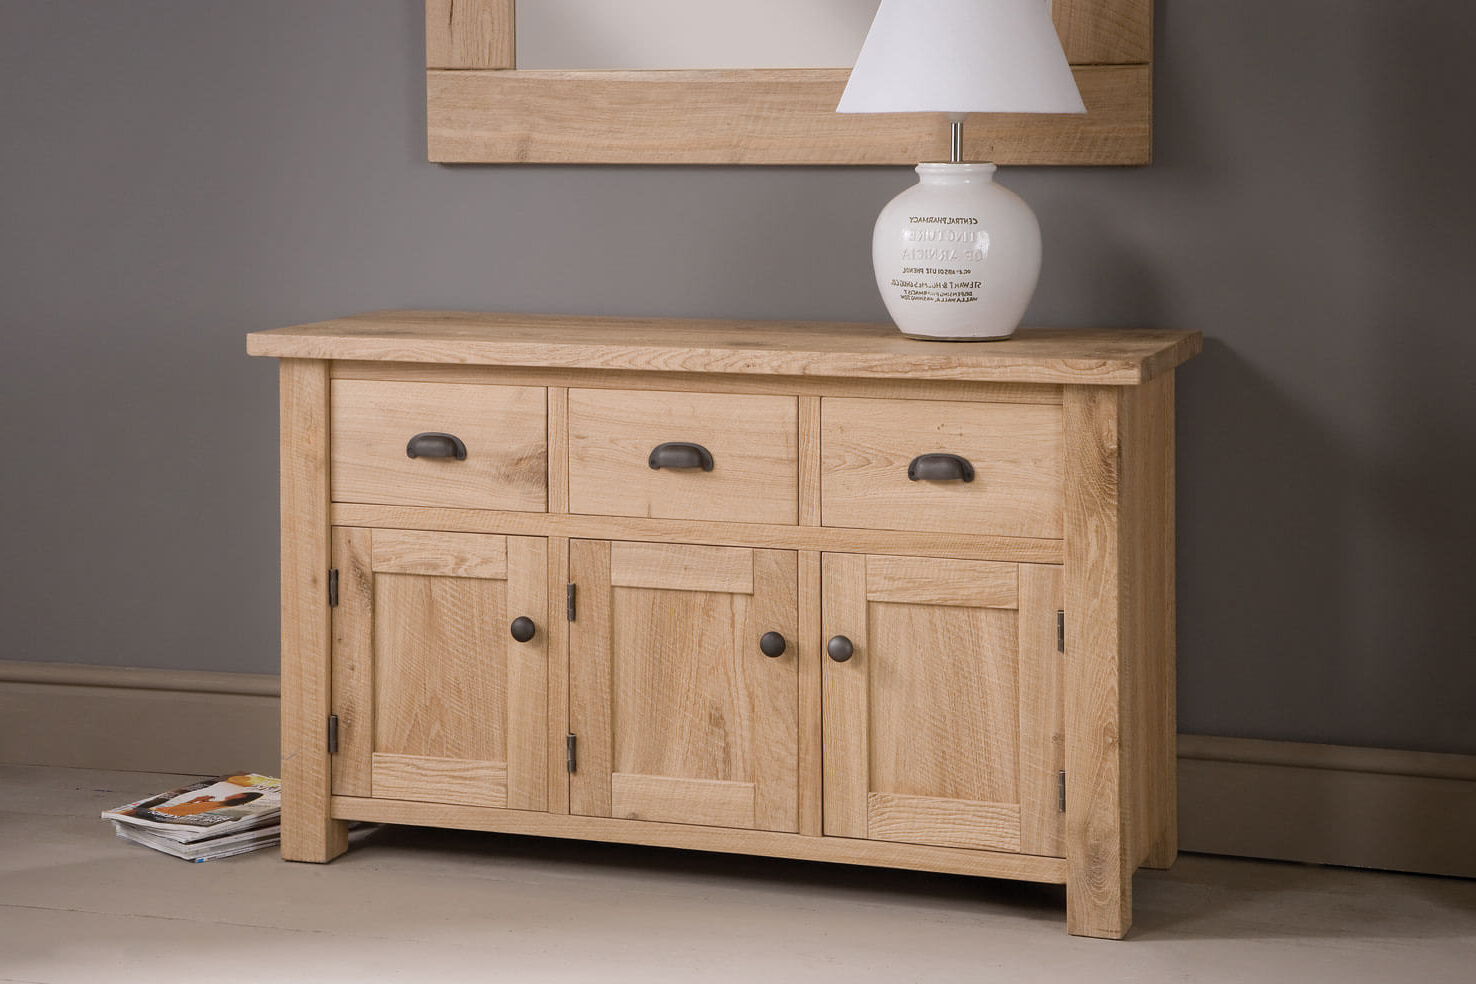 Newest Three Drawer Oak Sideboard, Handcraftedindigo Furniture Throughout Natural Oak Wood 78 Inch Sideboards (View 14 of 20)